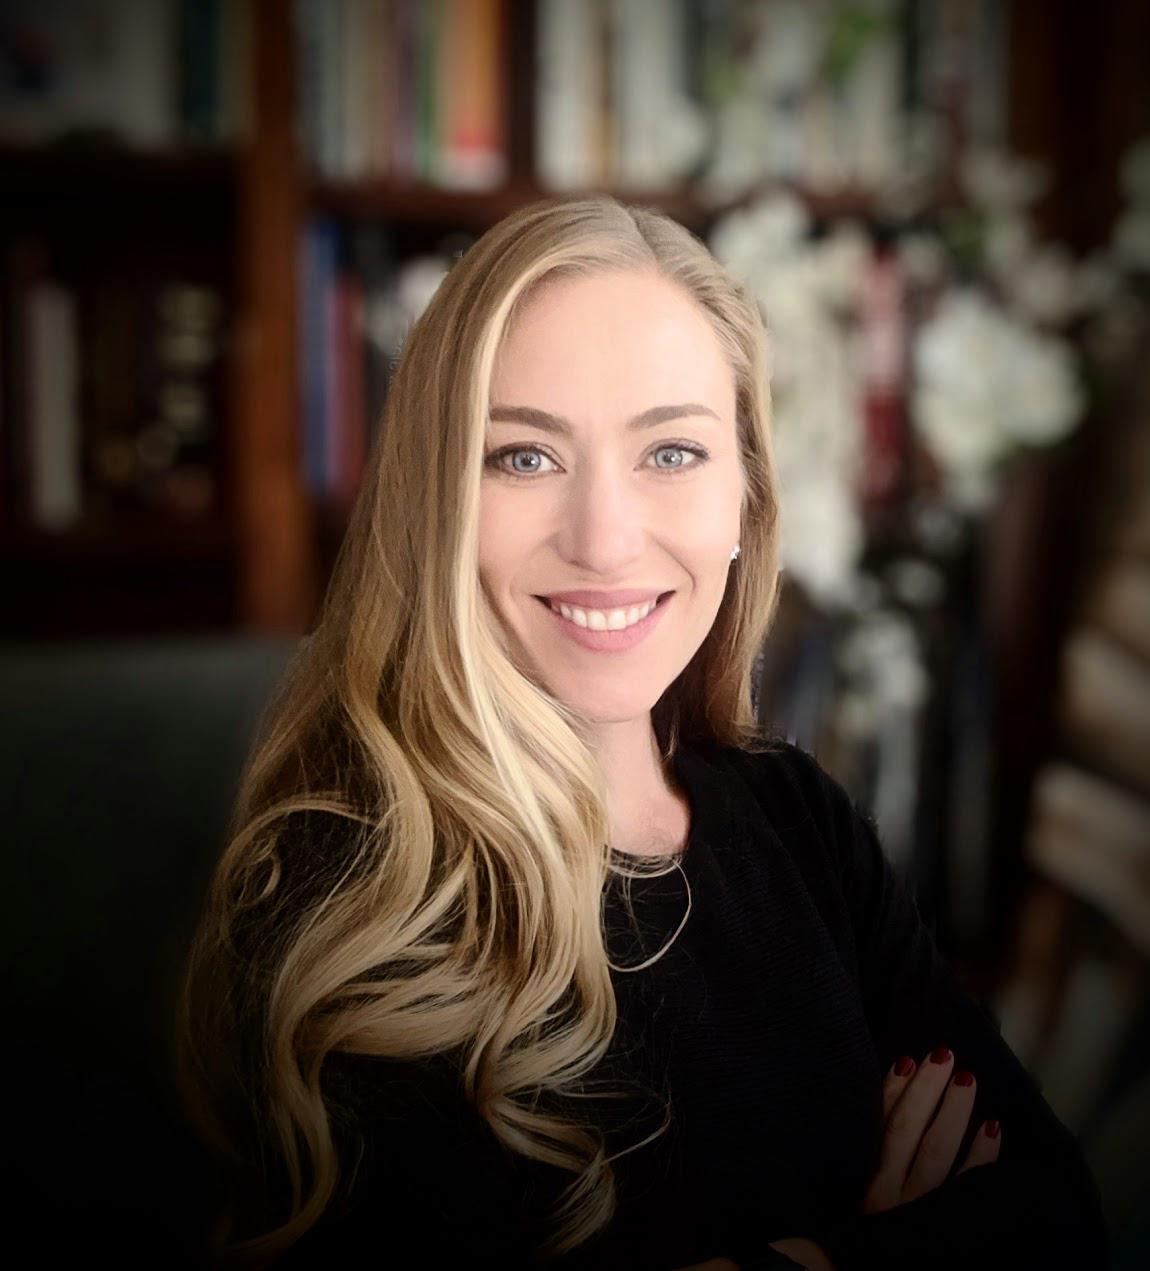 Jessica Earnest